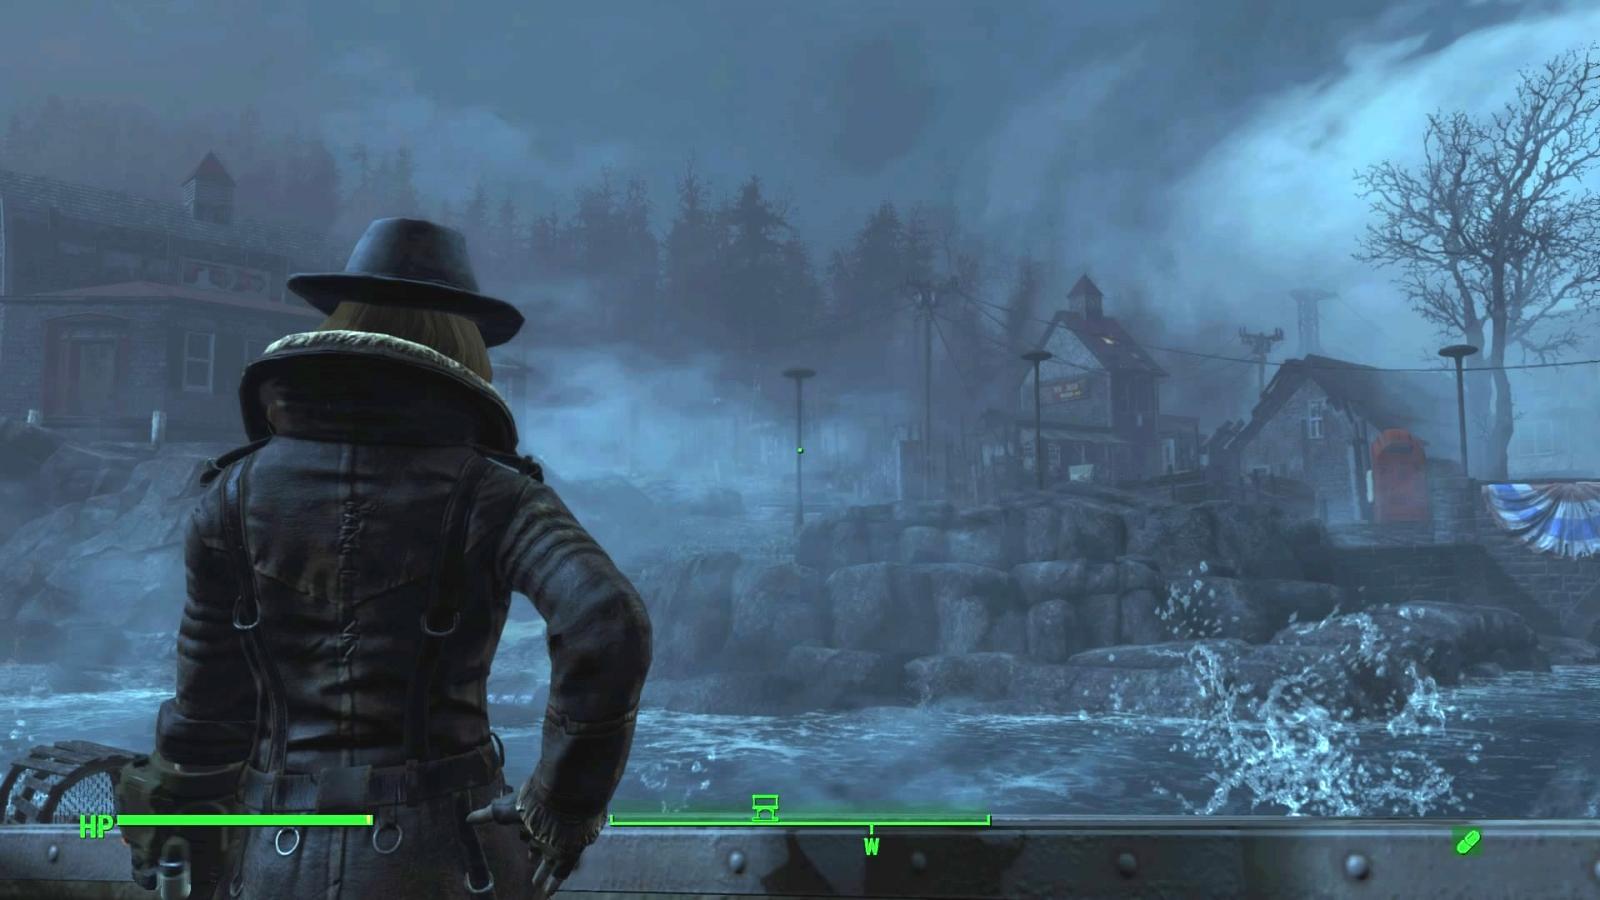 fallout 4 far harbor release